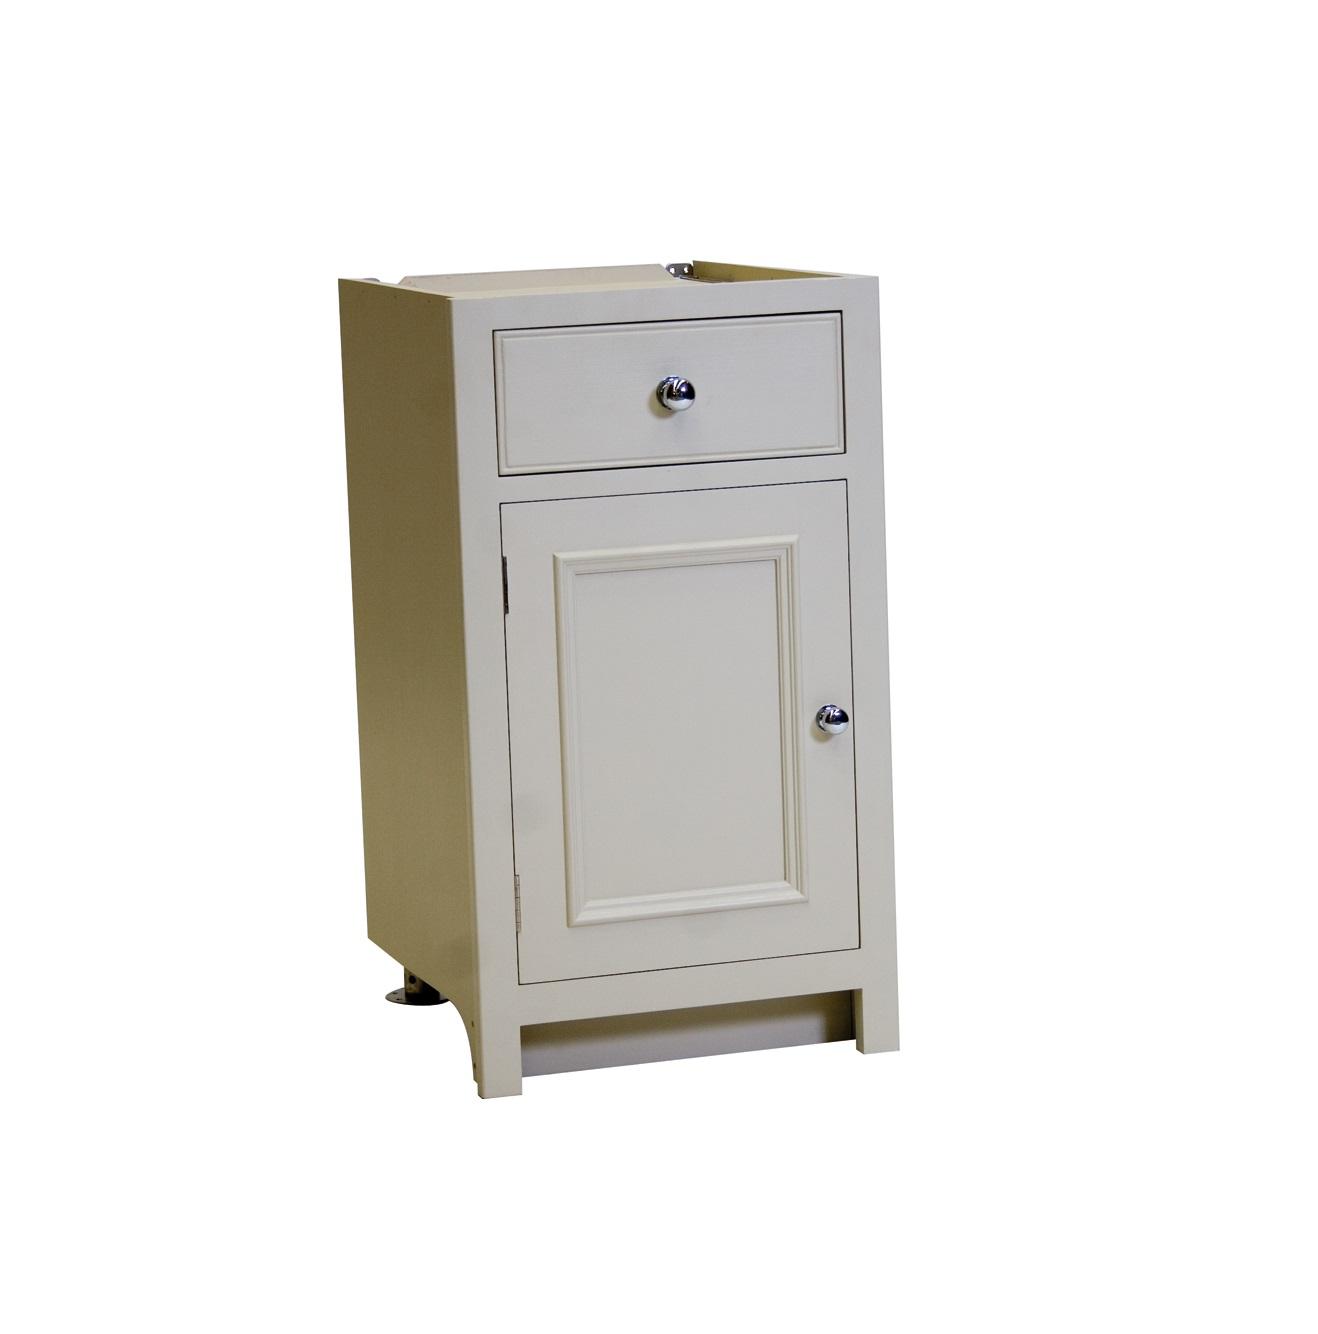 Neptune Chichester 500 1 Door 1 Drawer Base Cabinet- Left hinge